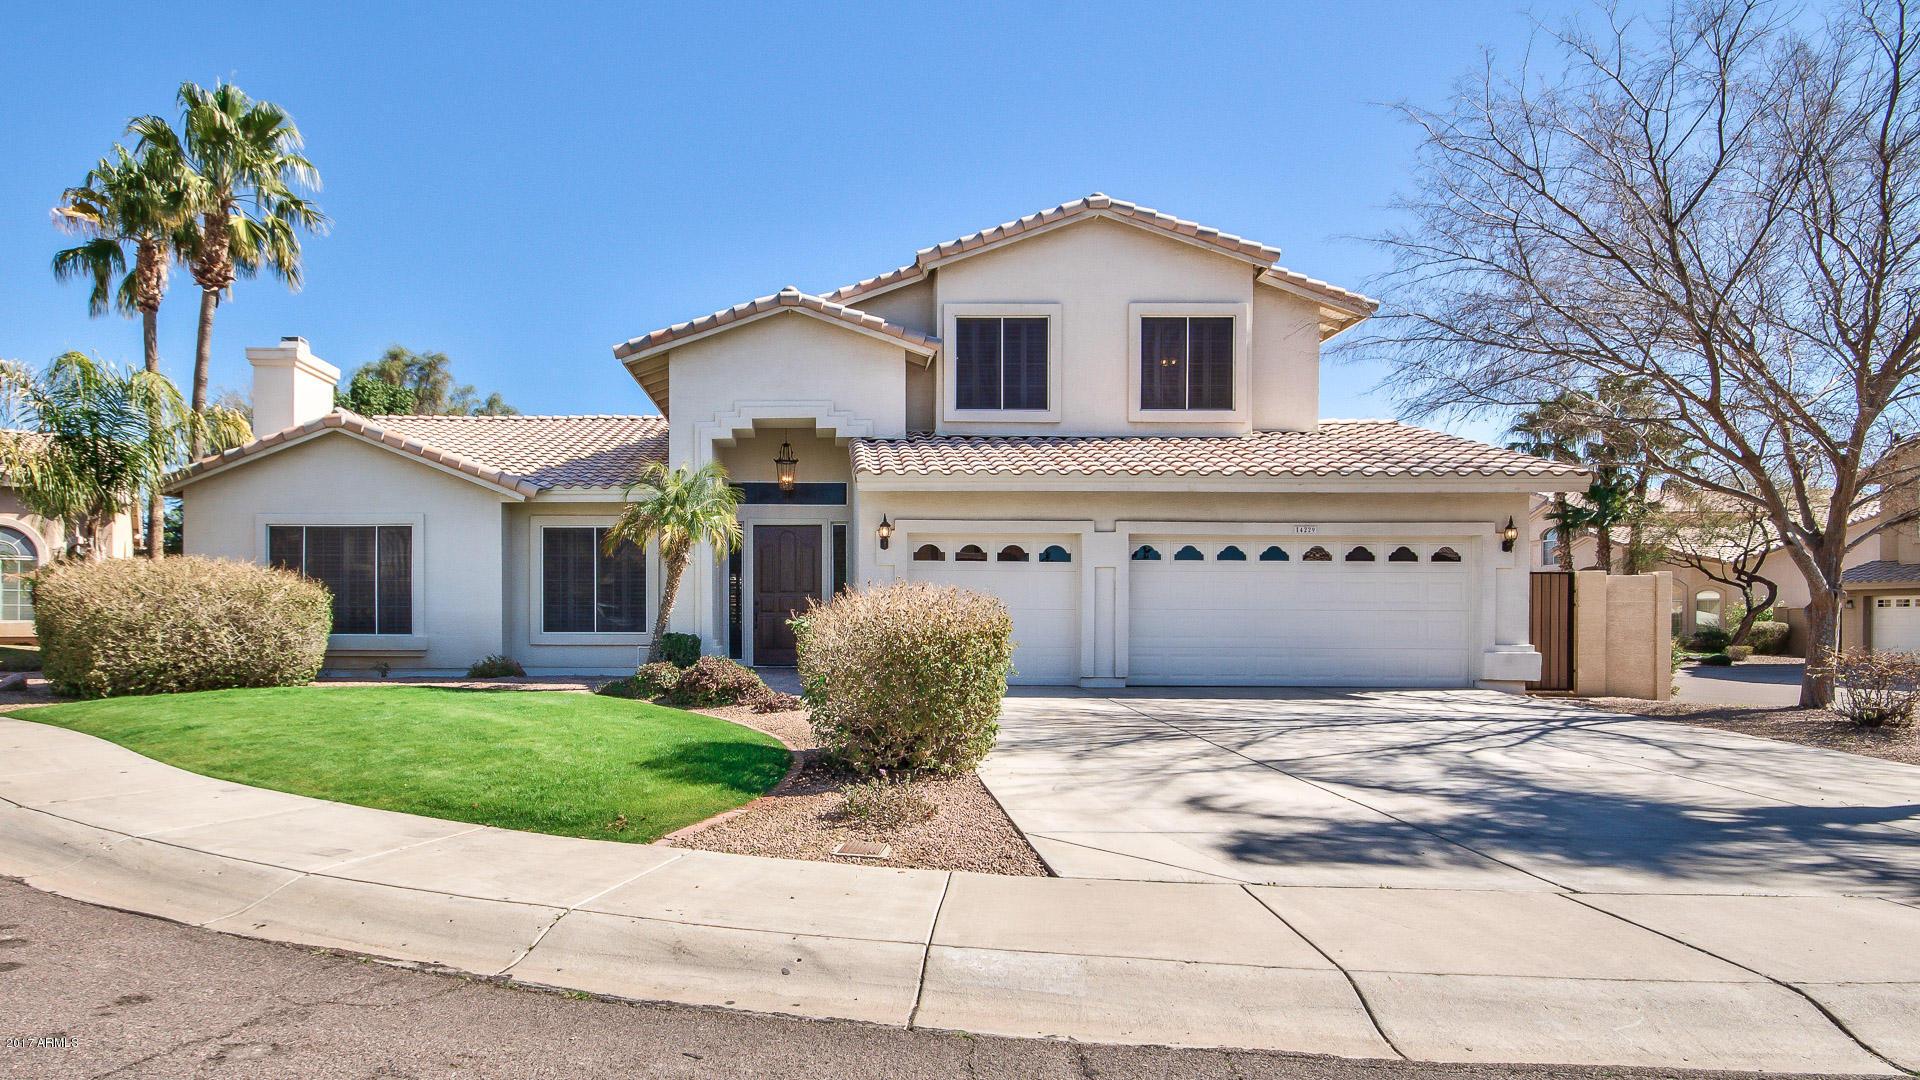 14229 69TH Way, Scottsdale, Arizona 85254, 4 Bedrooms Bedrooms, ,2.5 BathroomsBathrooms,Residential Rental,For Rent,69TH,6255478